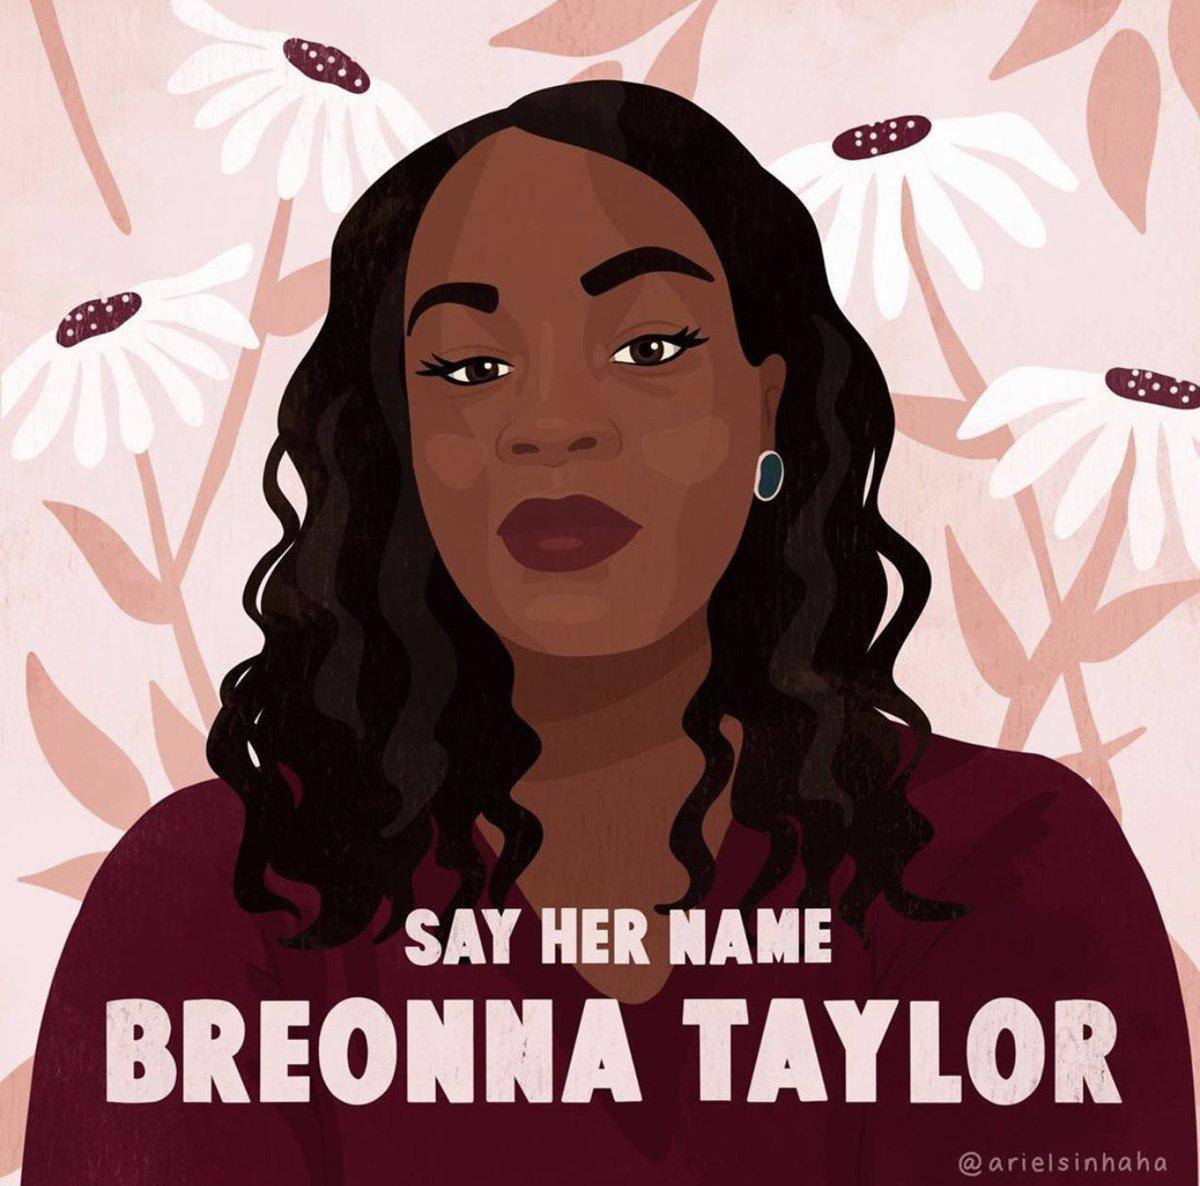 Say her name. #BreonnaTaylor